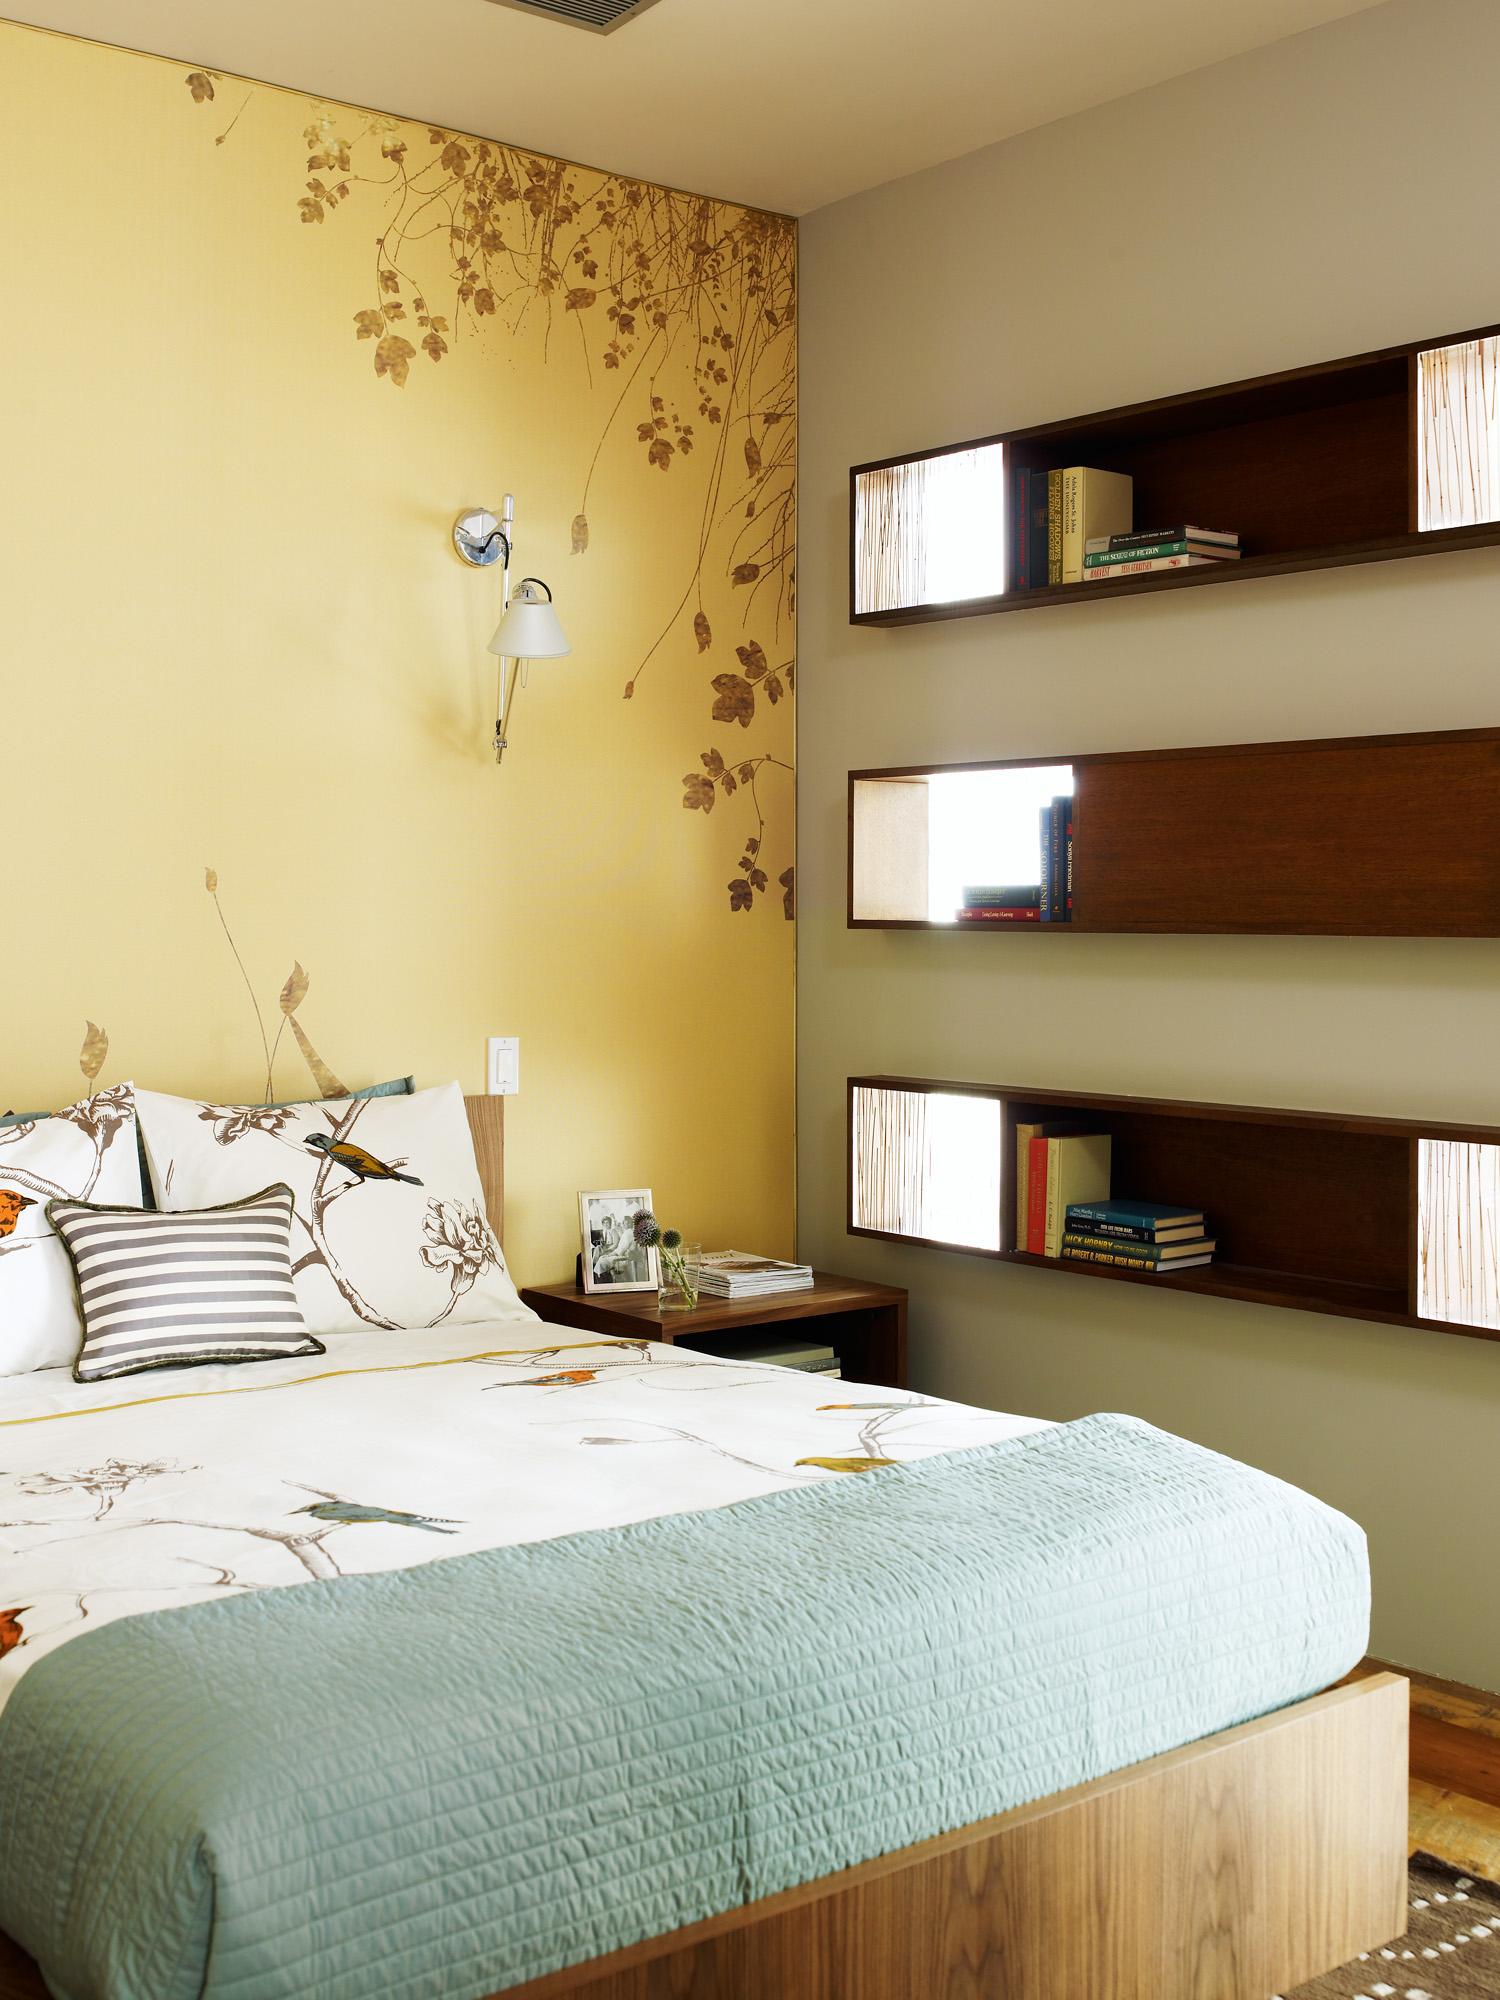 vogue bedroom slideshow the in best of bedrooms beautiful pictures most